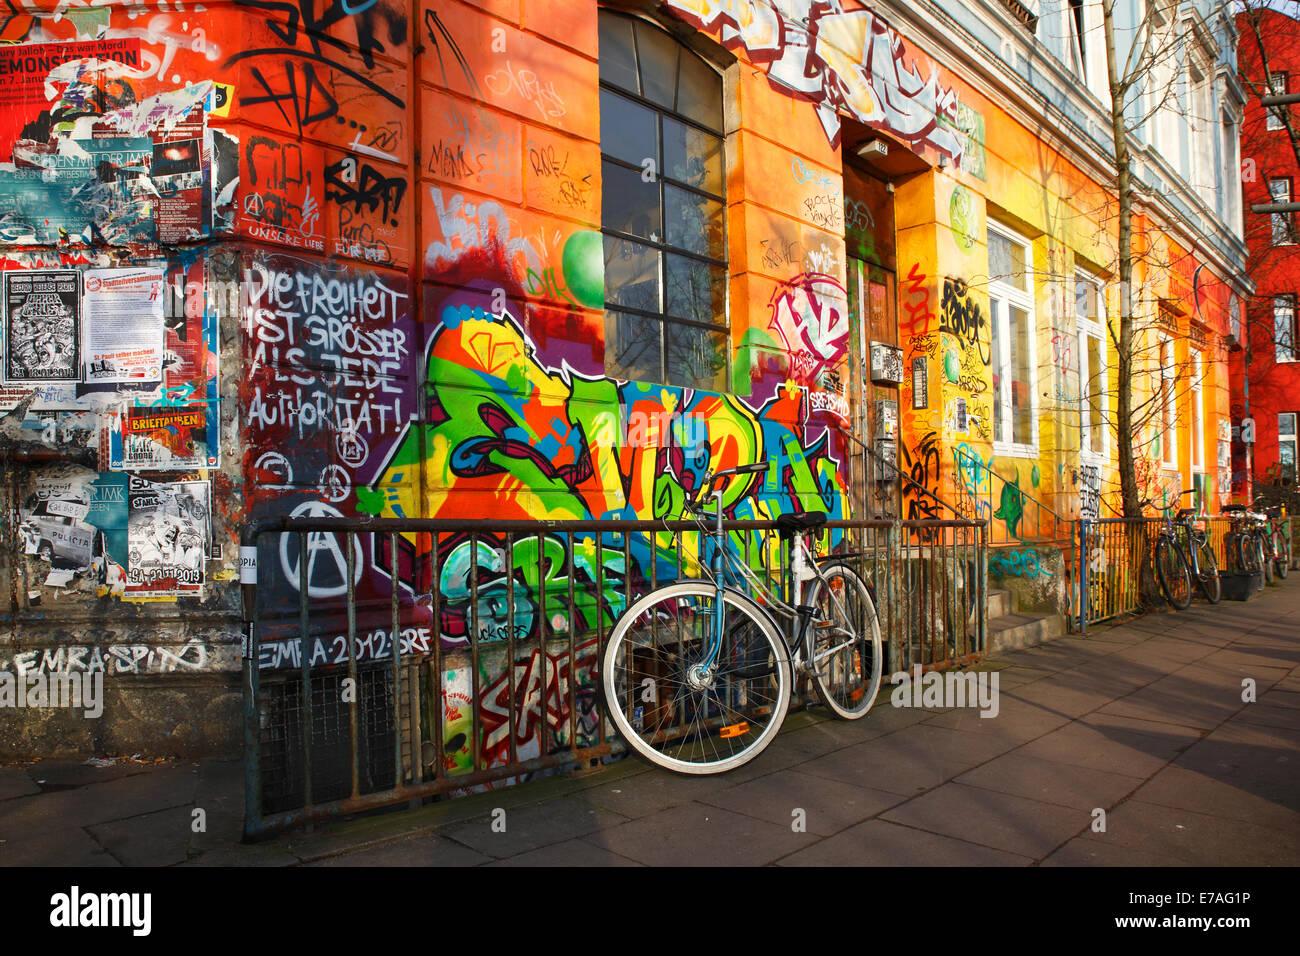 Bunt bemalten Häusern, alternative Szene, Hafenstraße, St. Pauli, Hamburg, Deutschland Stockbild